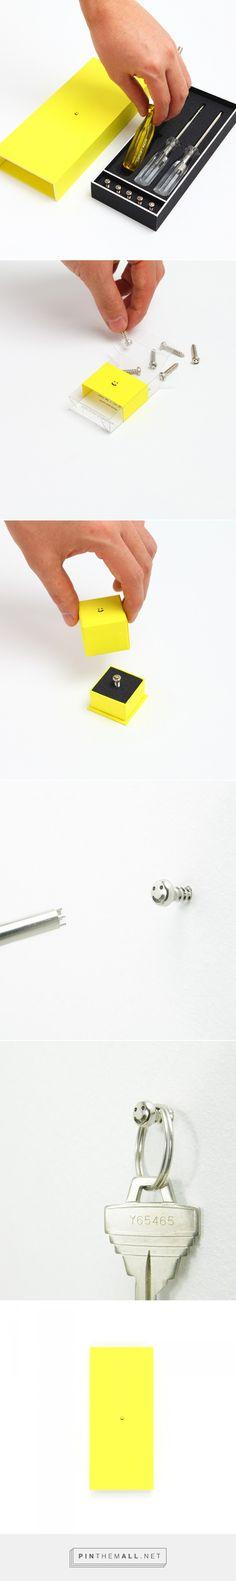 smile screws by studio yumakano | Designboom Shop - created via https://pinthemall.net